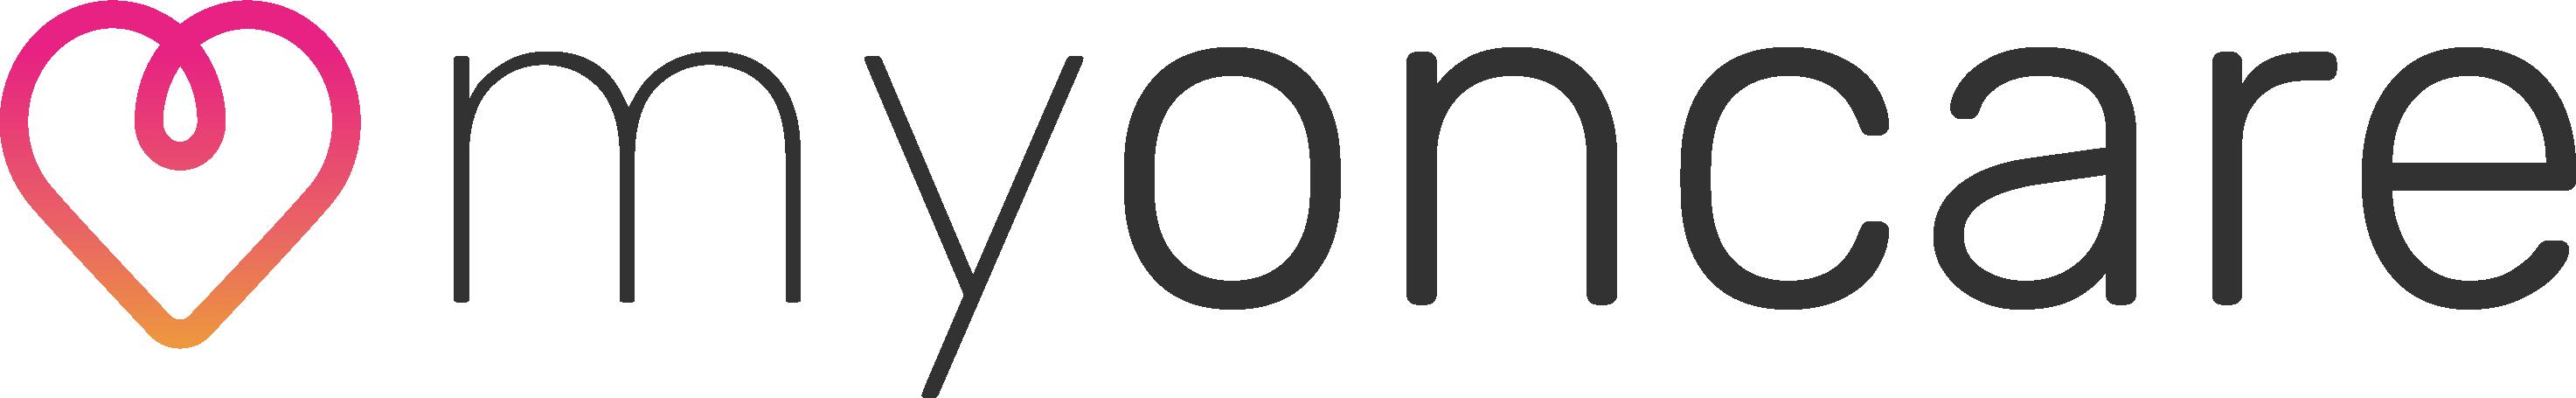 myoncare logo